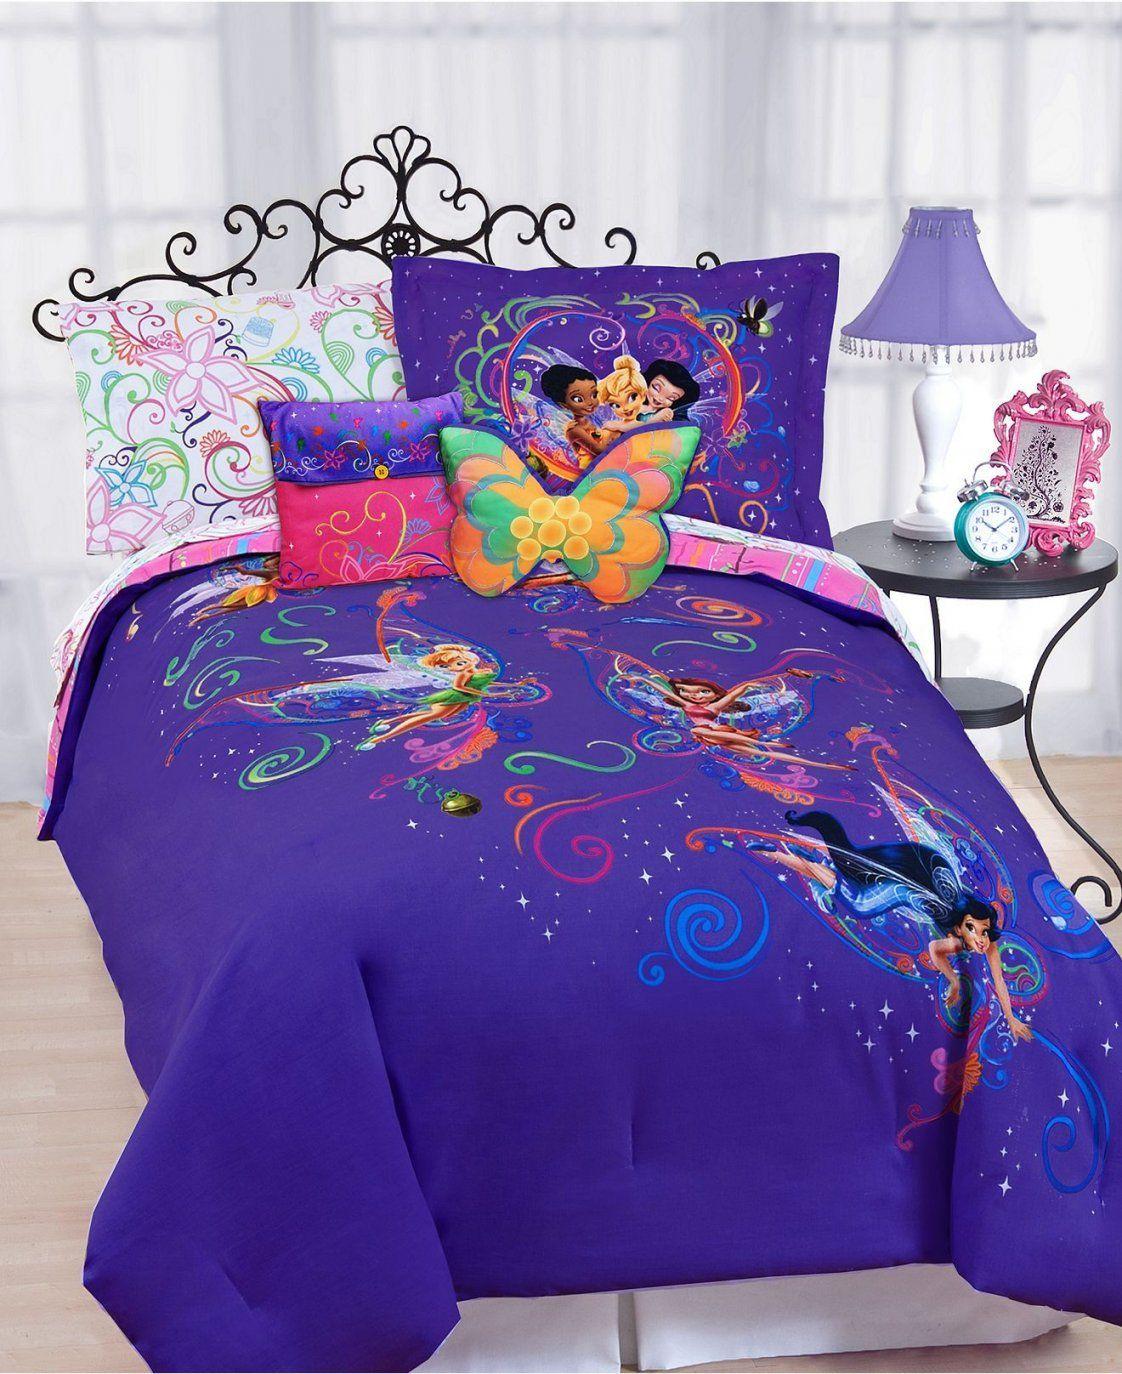 Disney Bedding Surreal Garden Disney Tinkerbell Comforter Sets von Tinker Bell Bed Sets Bild